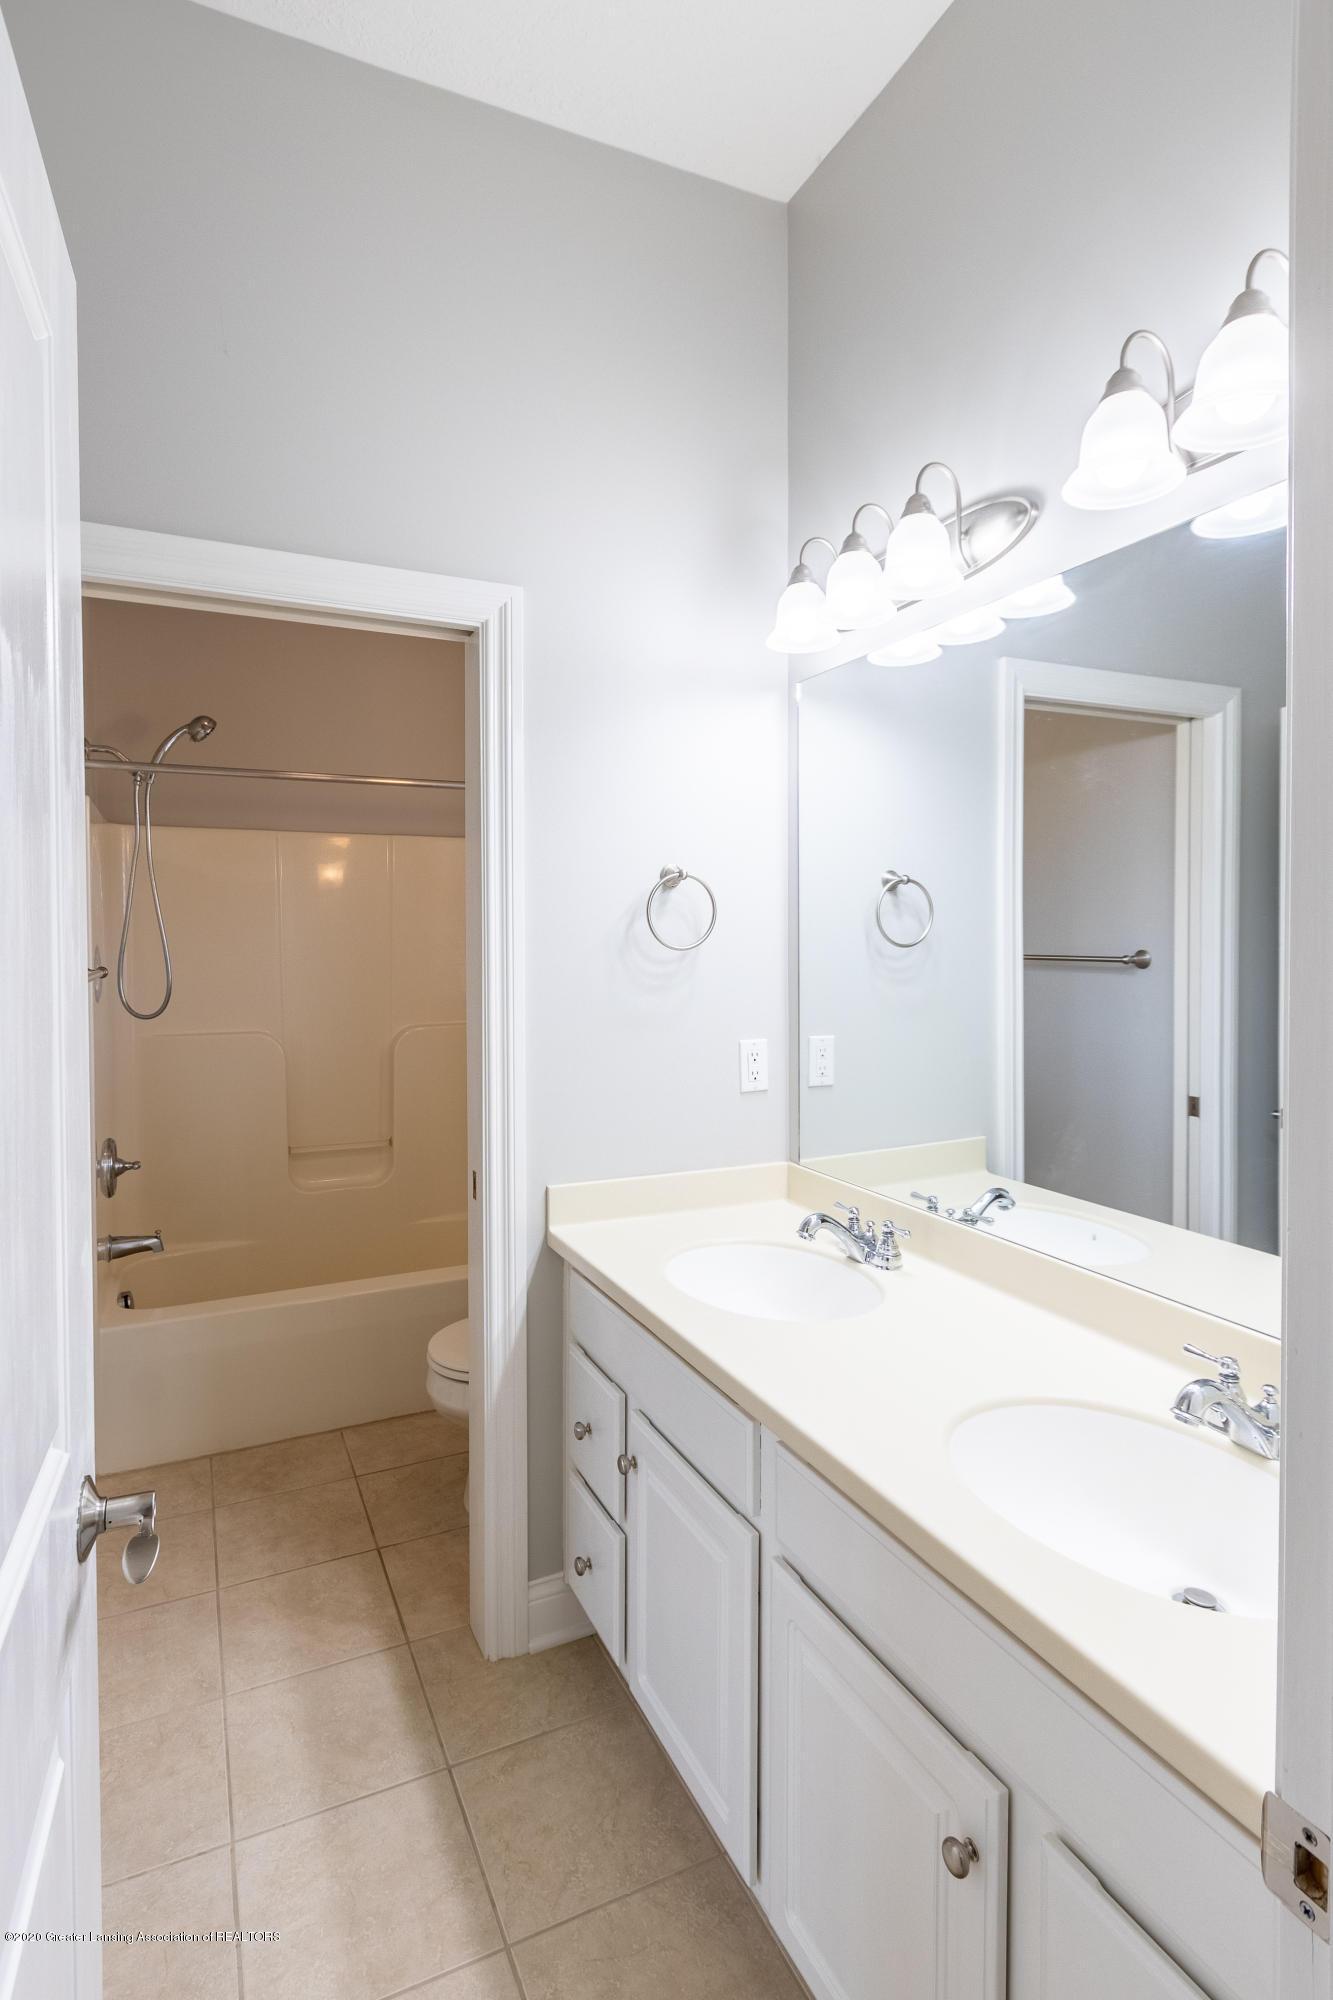 3929 Baulistrol Dr - Bedroom 1 & 2 Connected Full Bath - 36